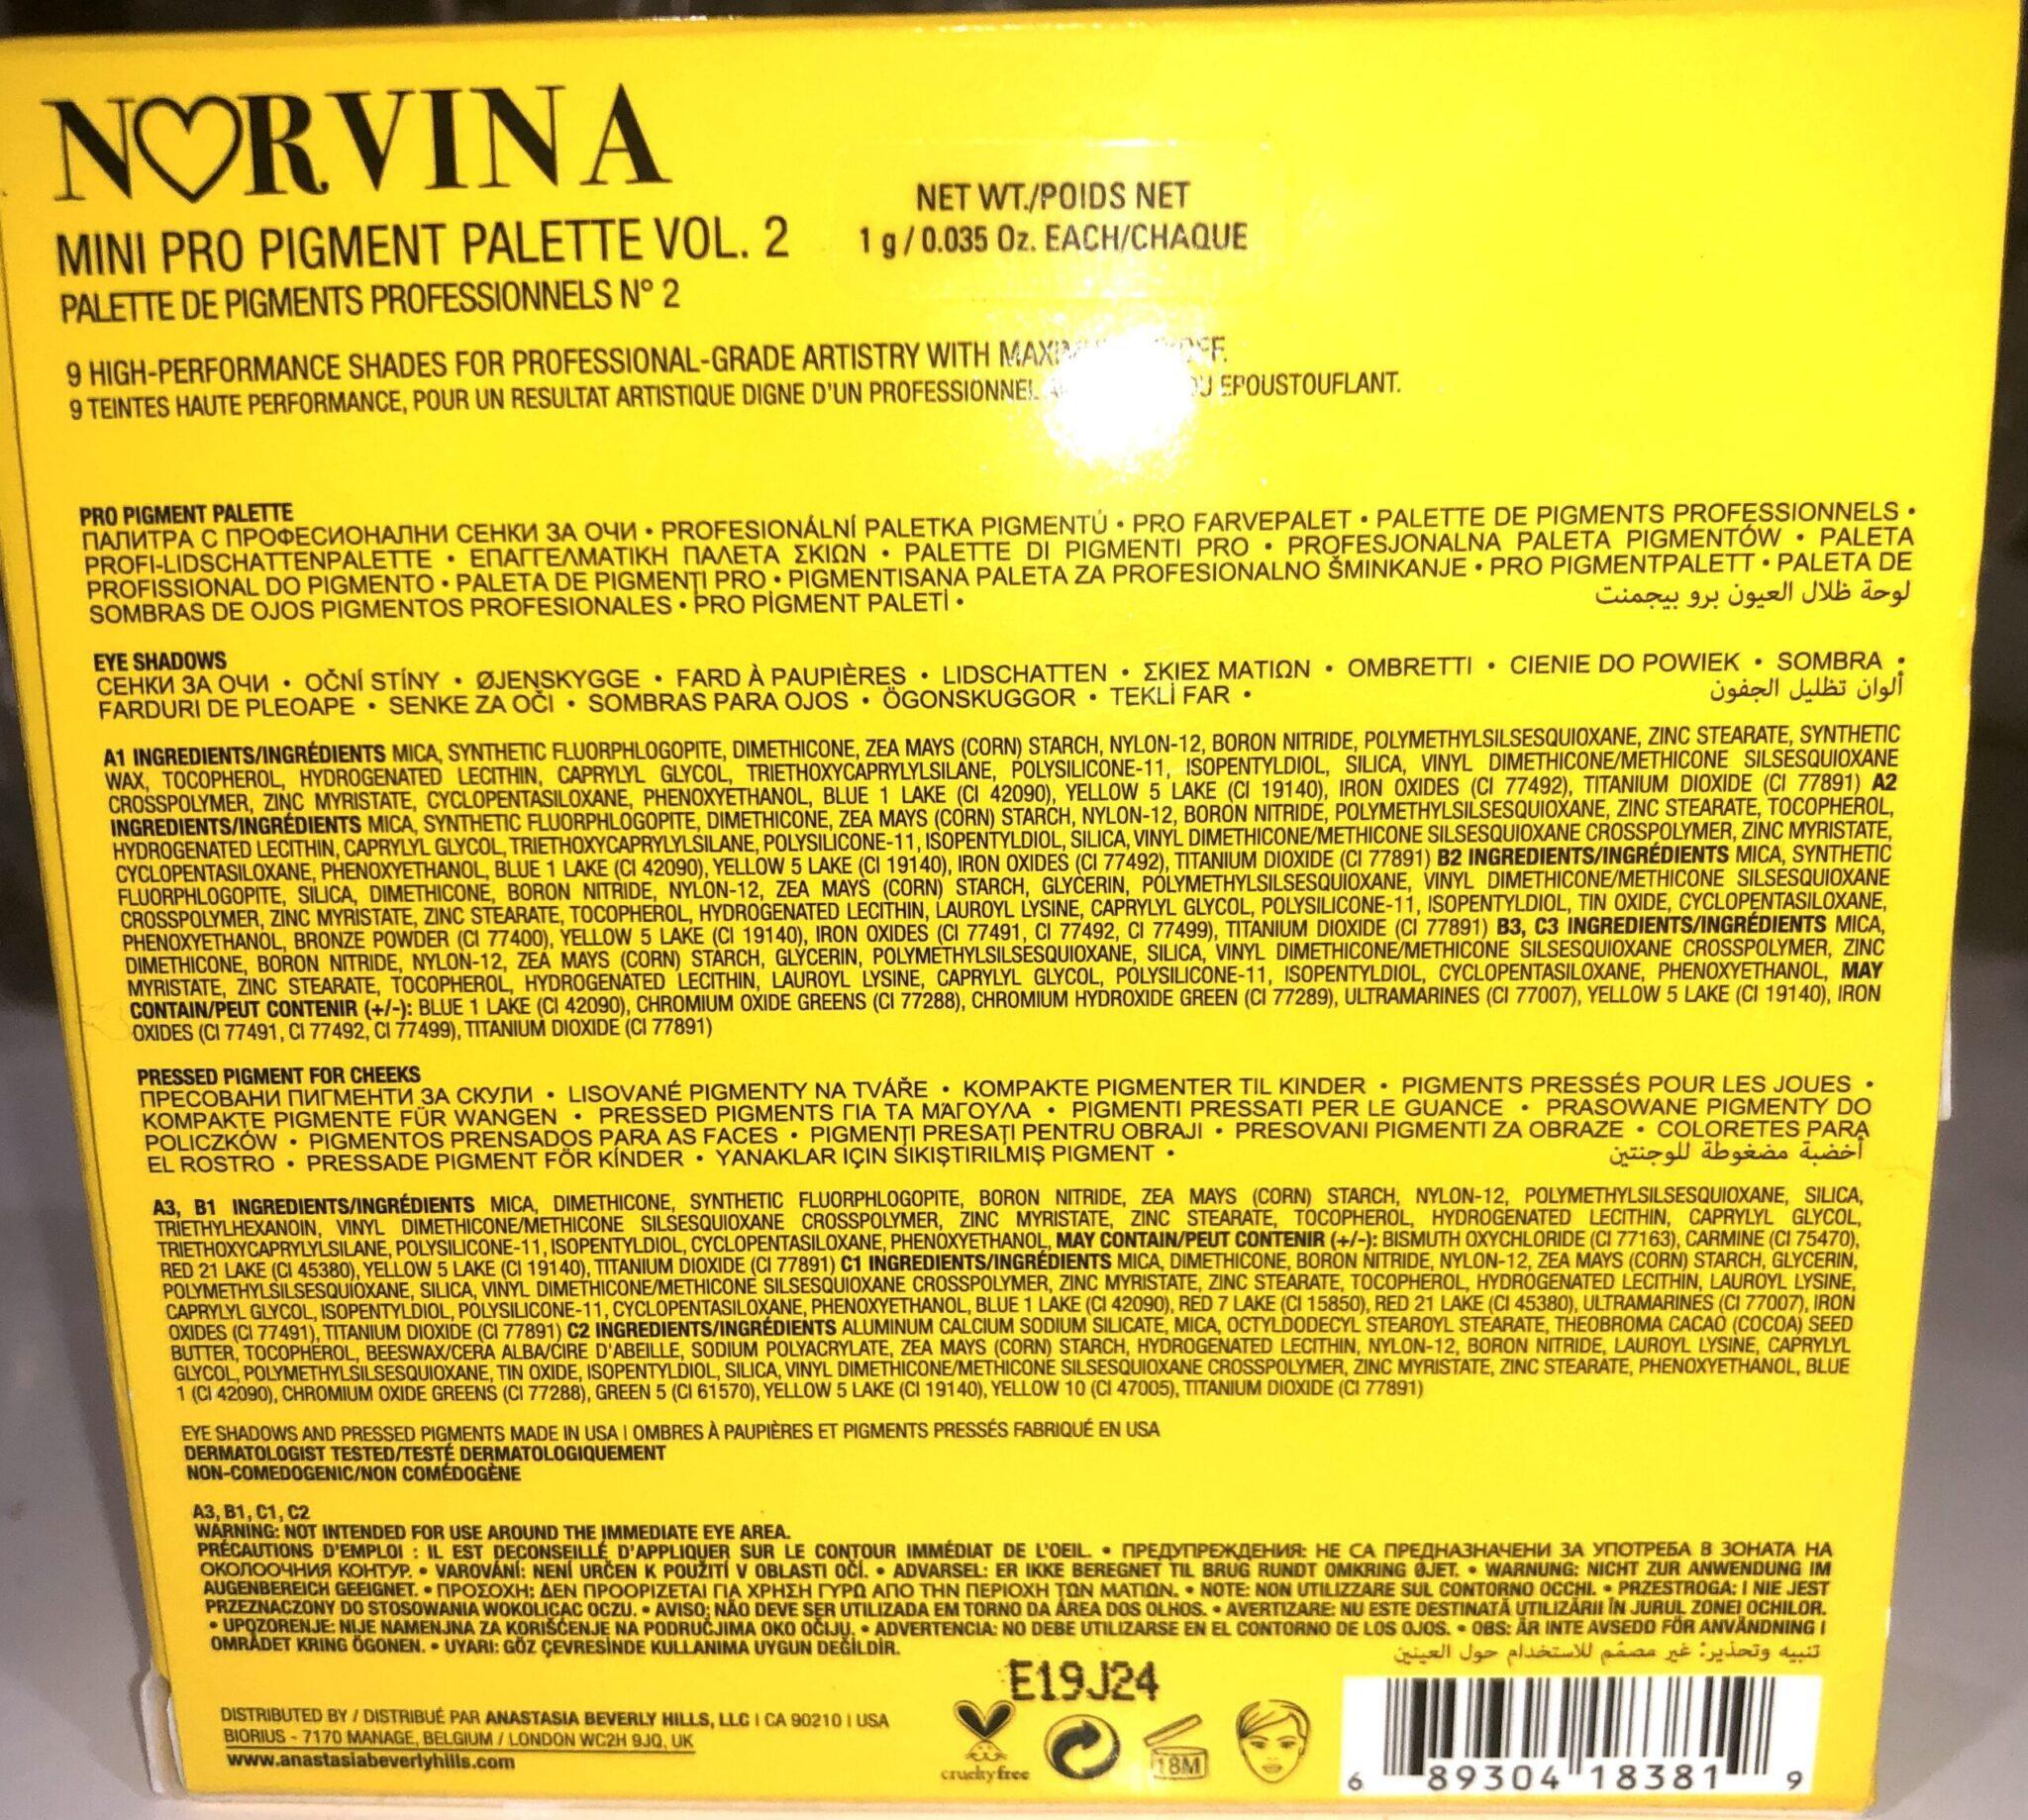 MINI NORVINA COLLECTION INGREDIENTS VOLUME 2